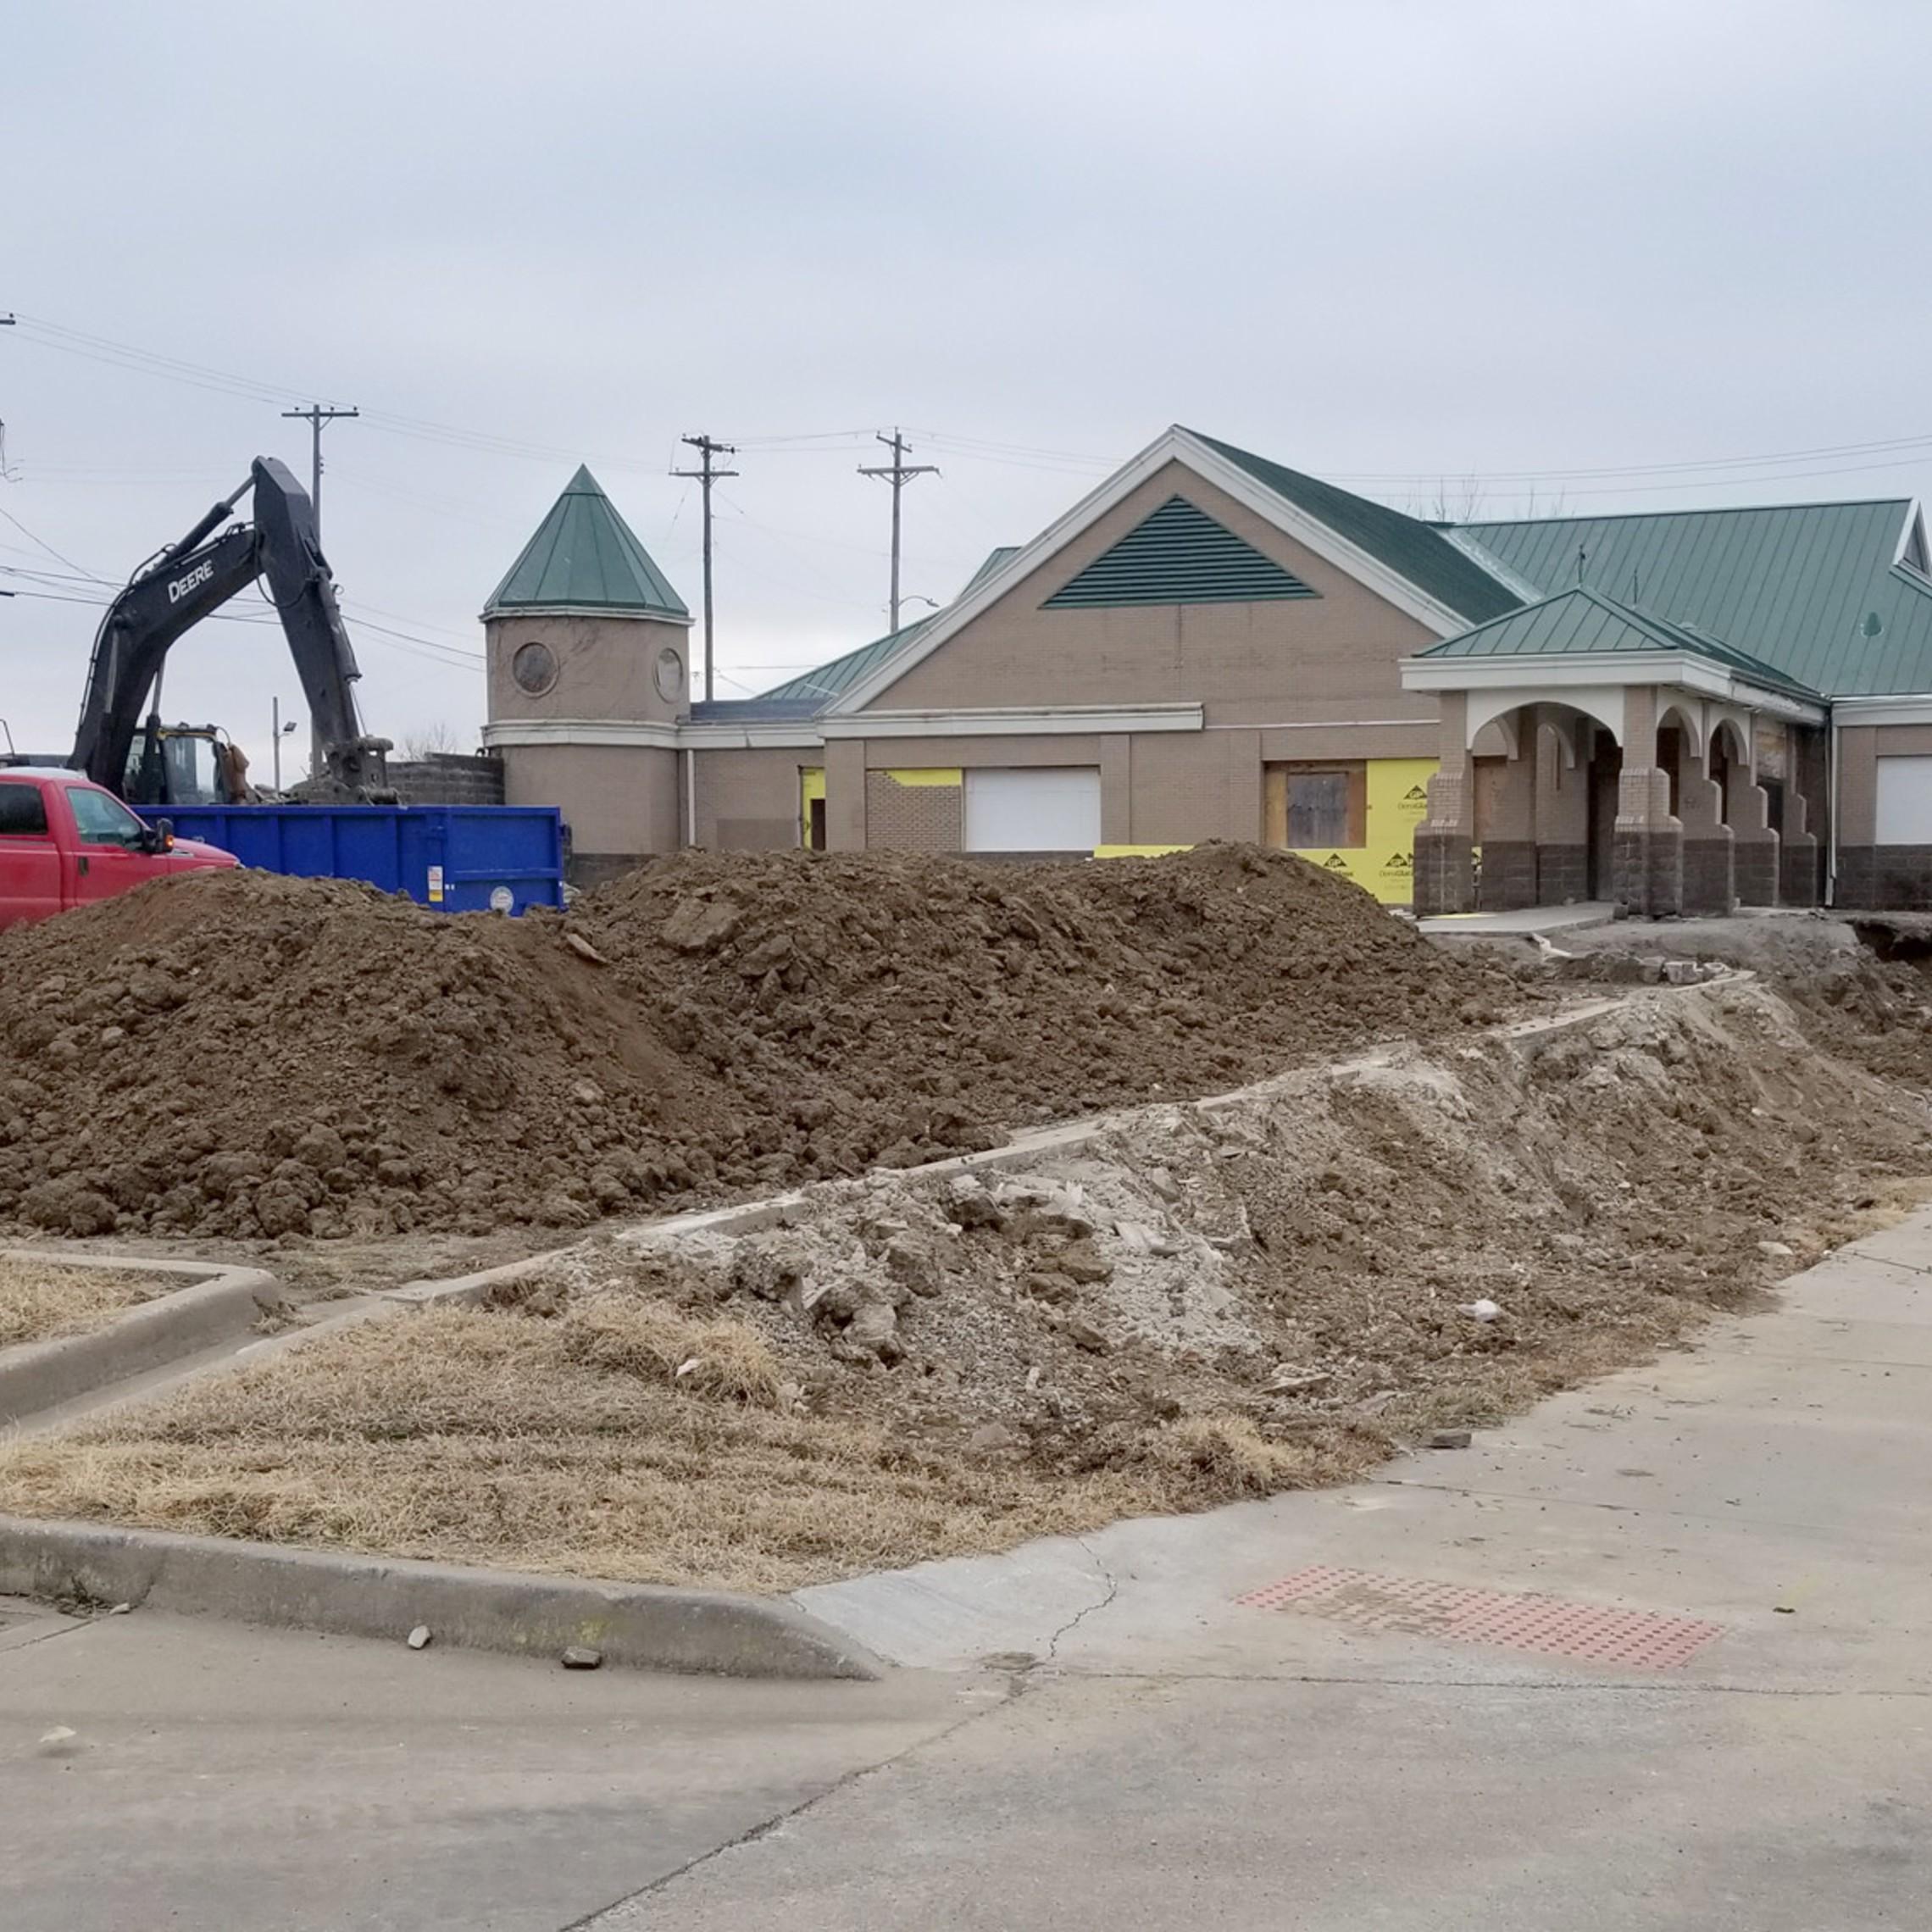 Renovation begun on Early Childhood Education & Development Center